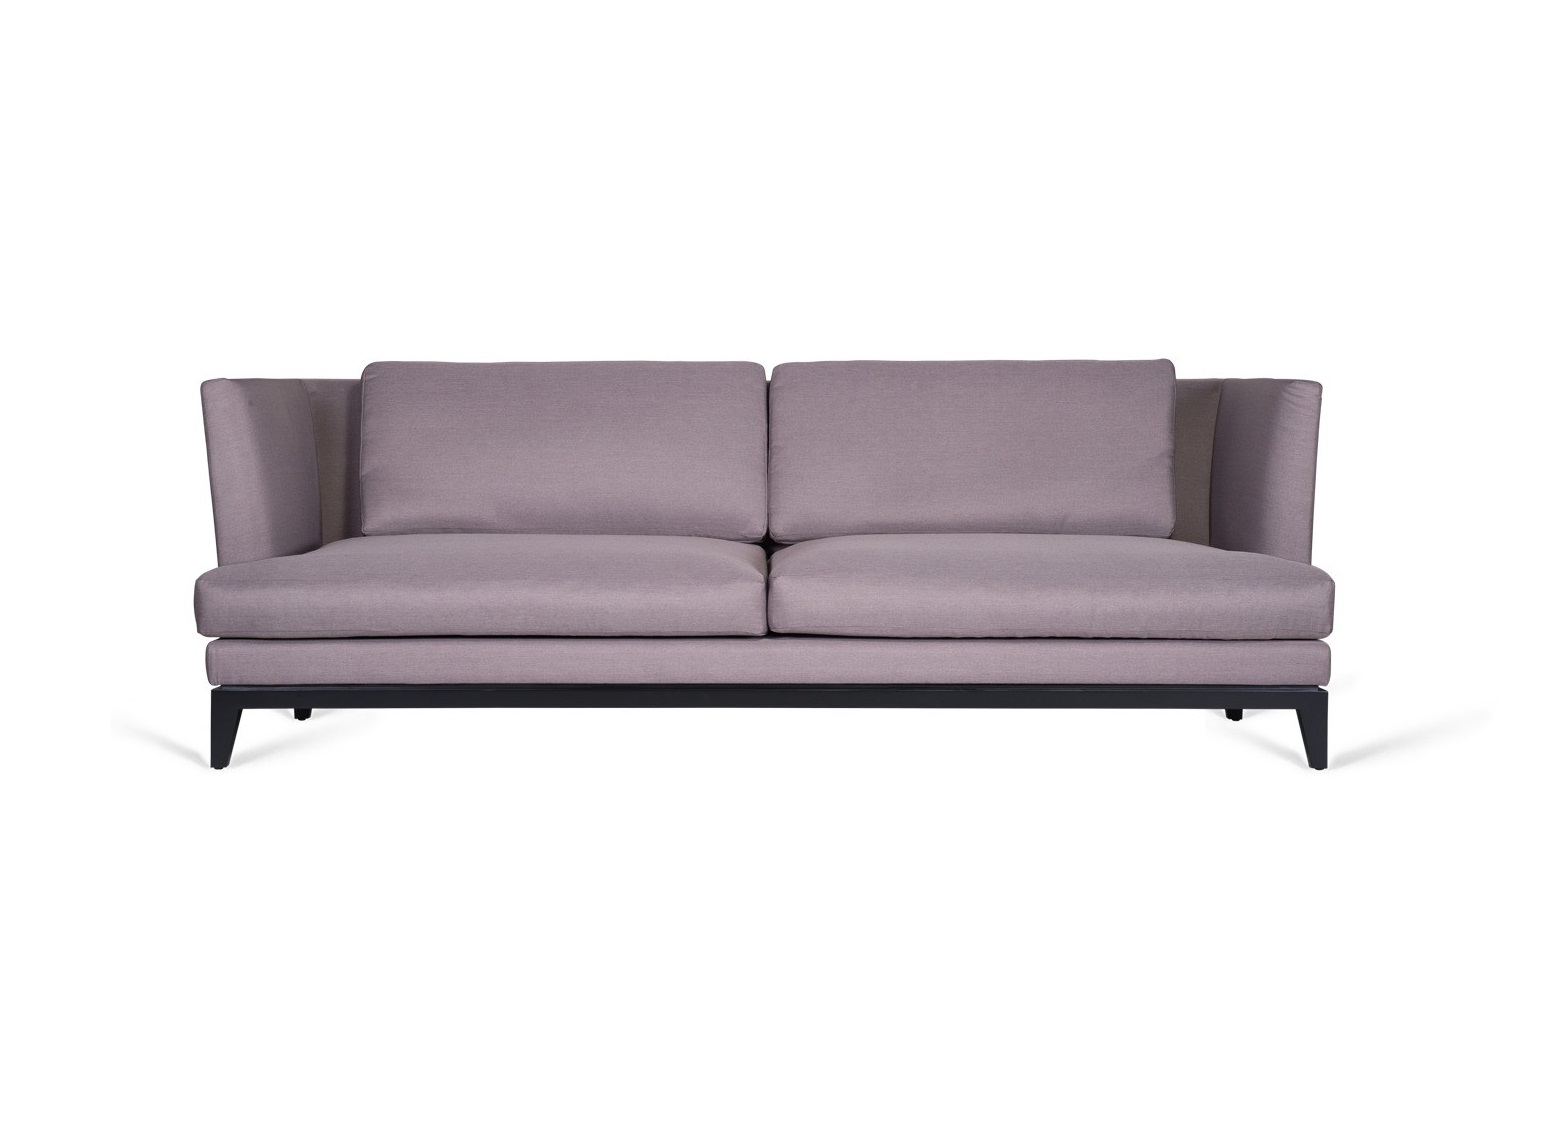 Диван PortoТрехместные диваны<br><br><br>Material: Текстиль<br>Ширина см: 235<br>Высота см: 80<br>Глубина см: 95